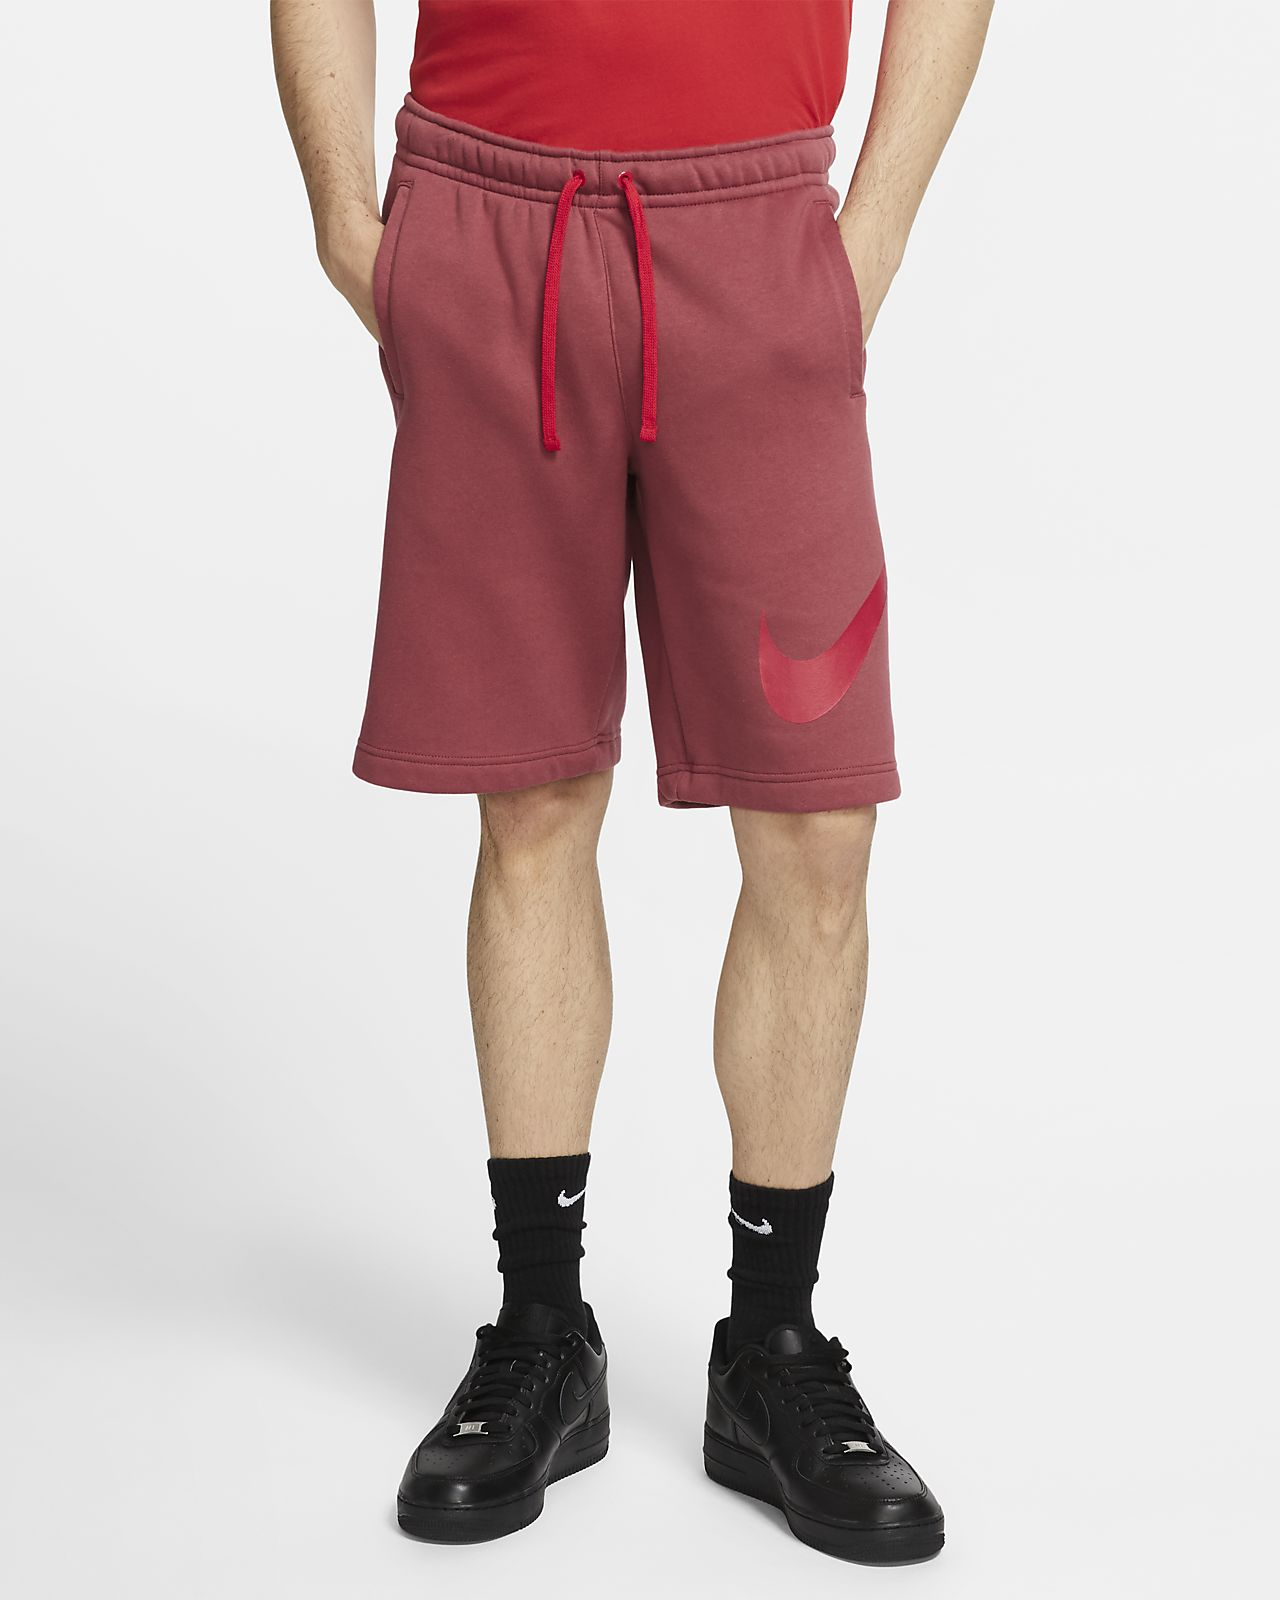 875a6bfac66 Nike Sportswear Club Fleece Men's Shorts